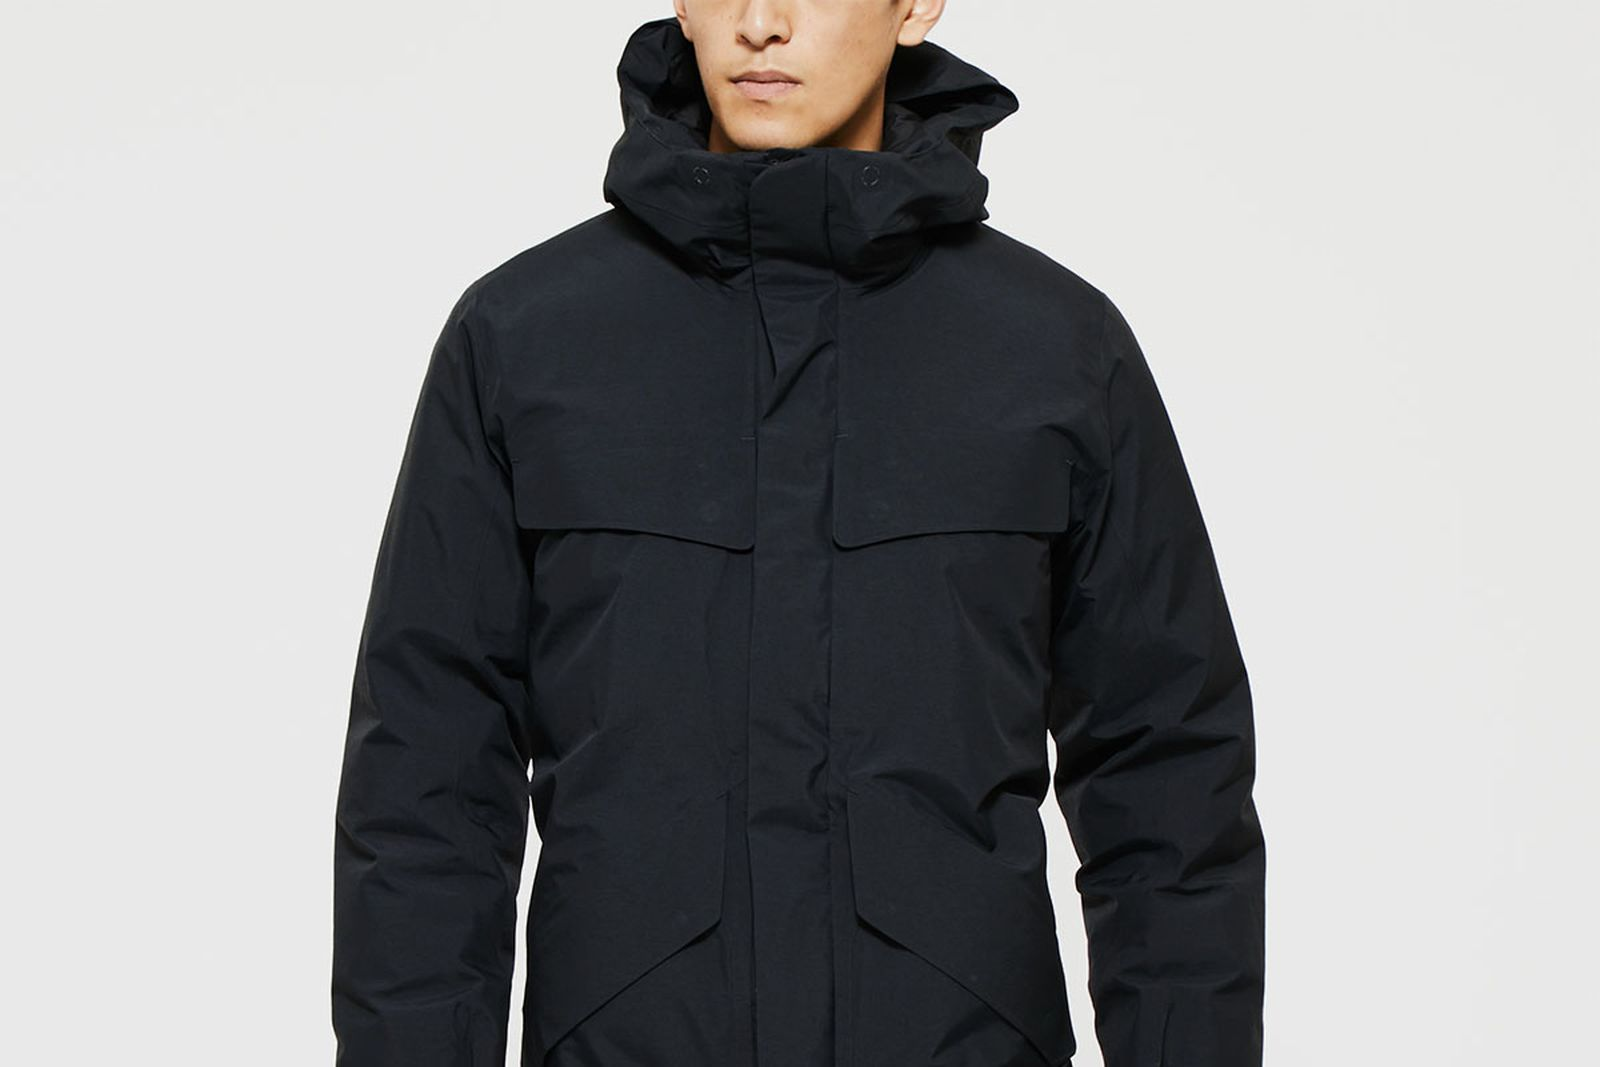 japanese-outerwear-goldwin-san-francisco-lifestyle-2